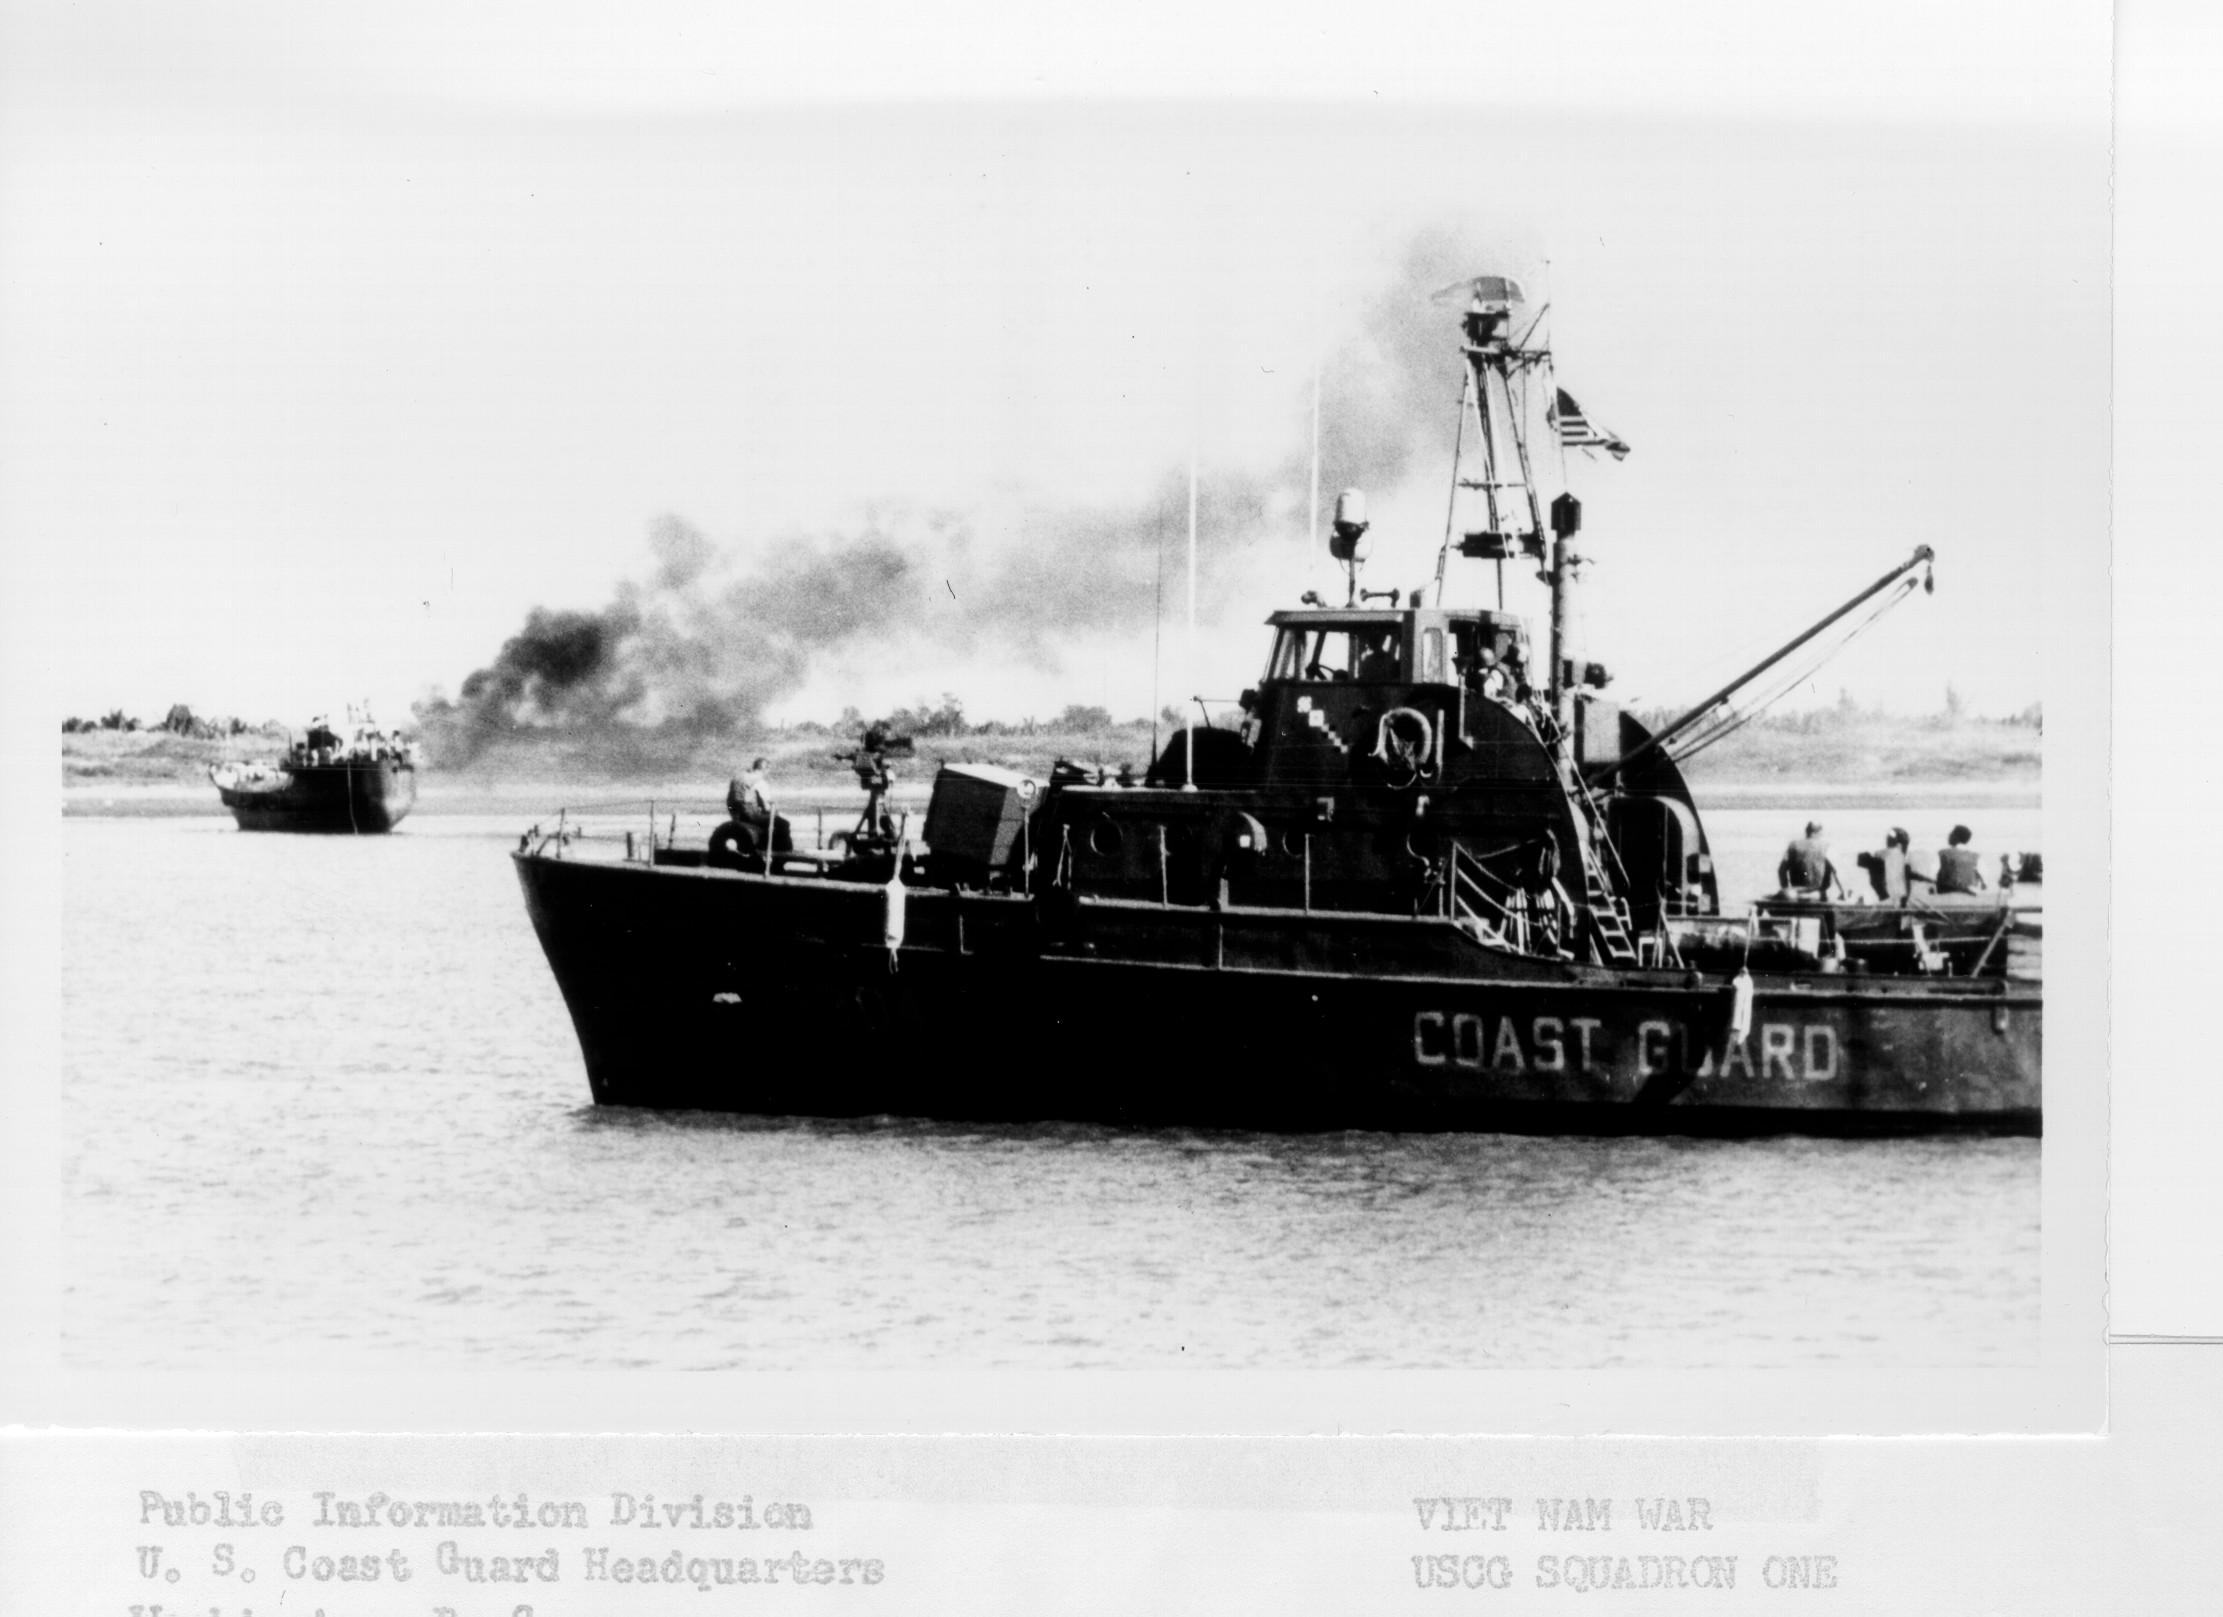 http://upload.wikimedia.org/wikipedia/commons/2/22/VTN_Burning_Trawler_sm.jpg